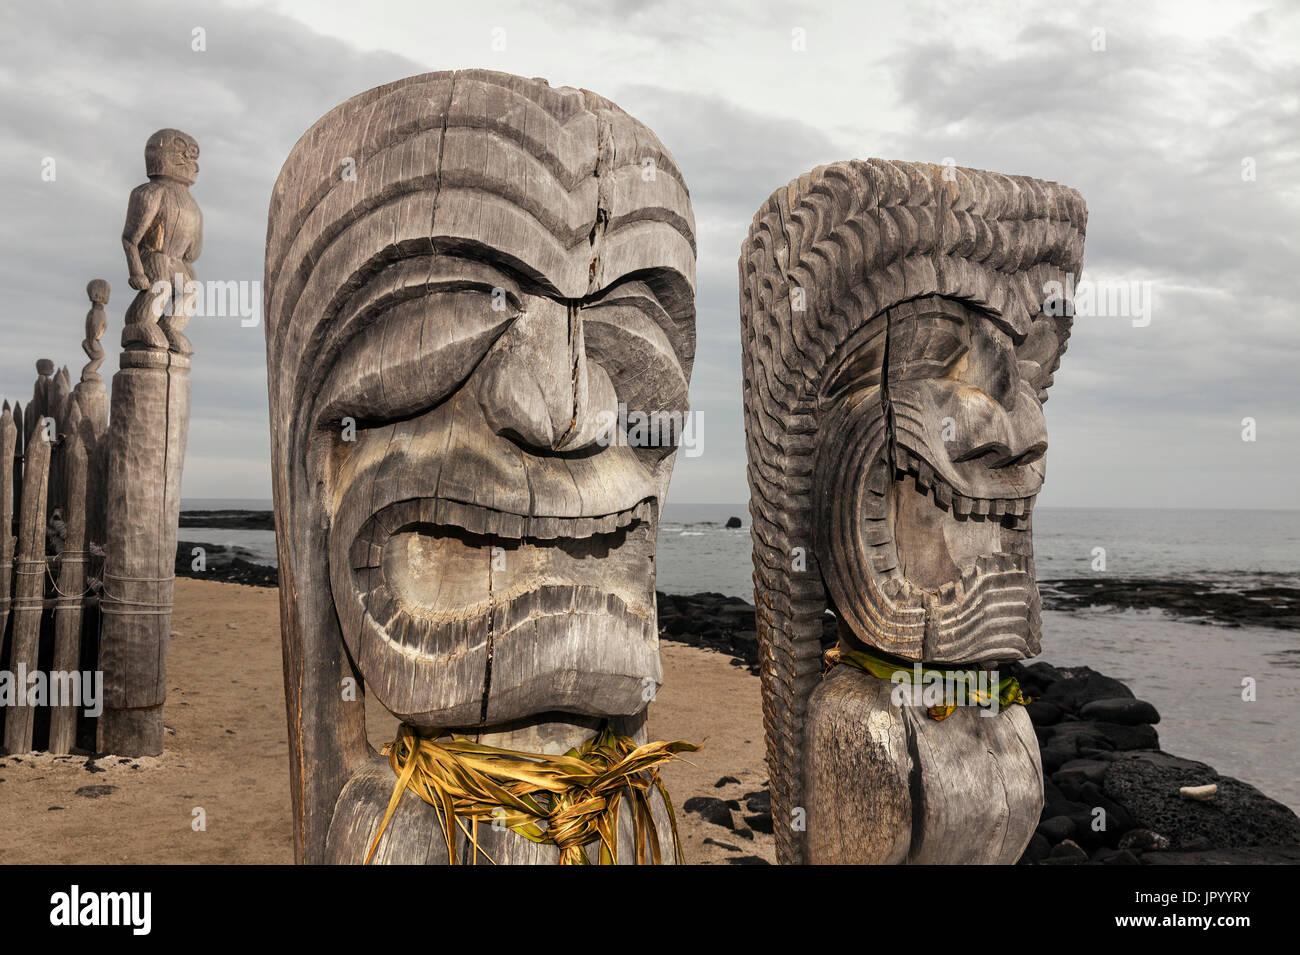 HI00234-00...HAWAI'I - Hale o Keawe (Ki'i) wooden images standing watch on the shore of  Honaunau Bay in Pu'uhonua Stock Photo